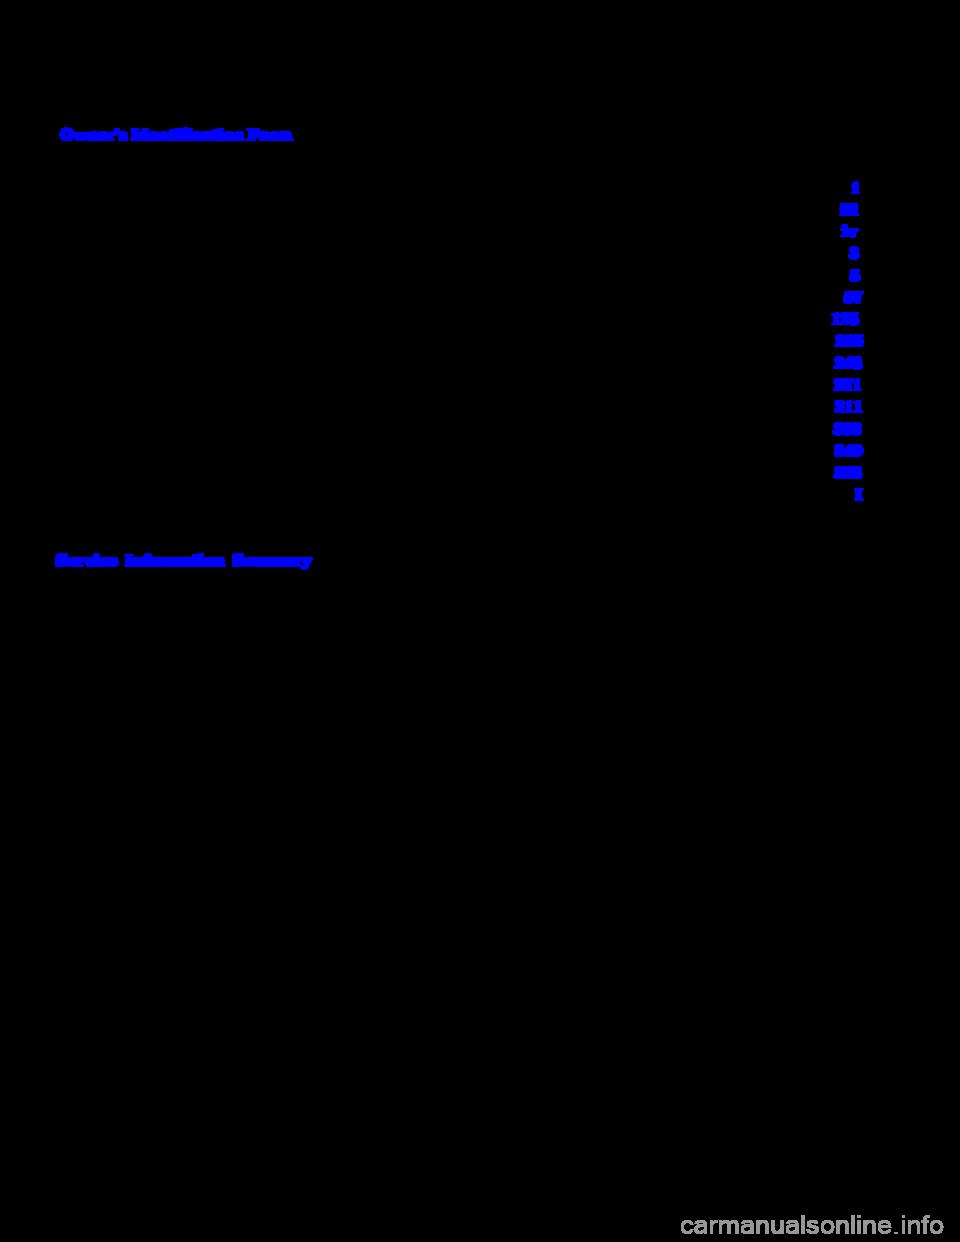 2008 honda crv owners manual